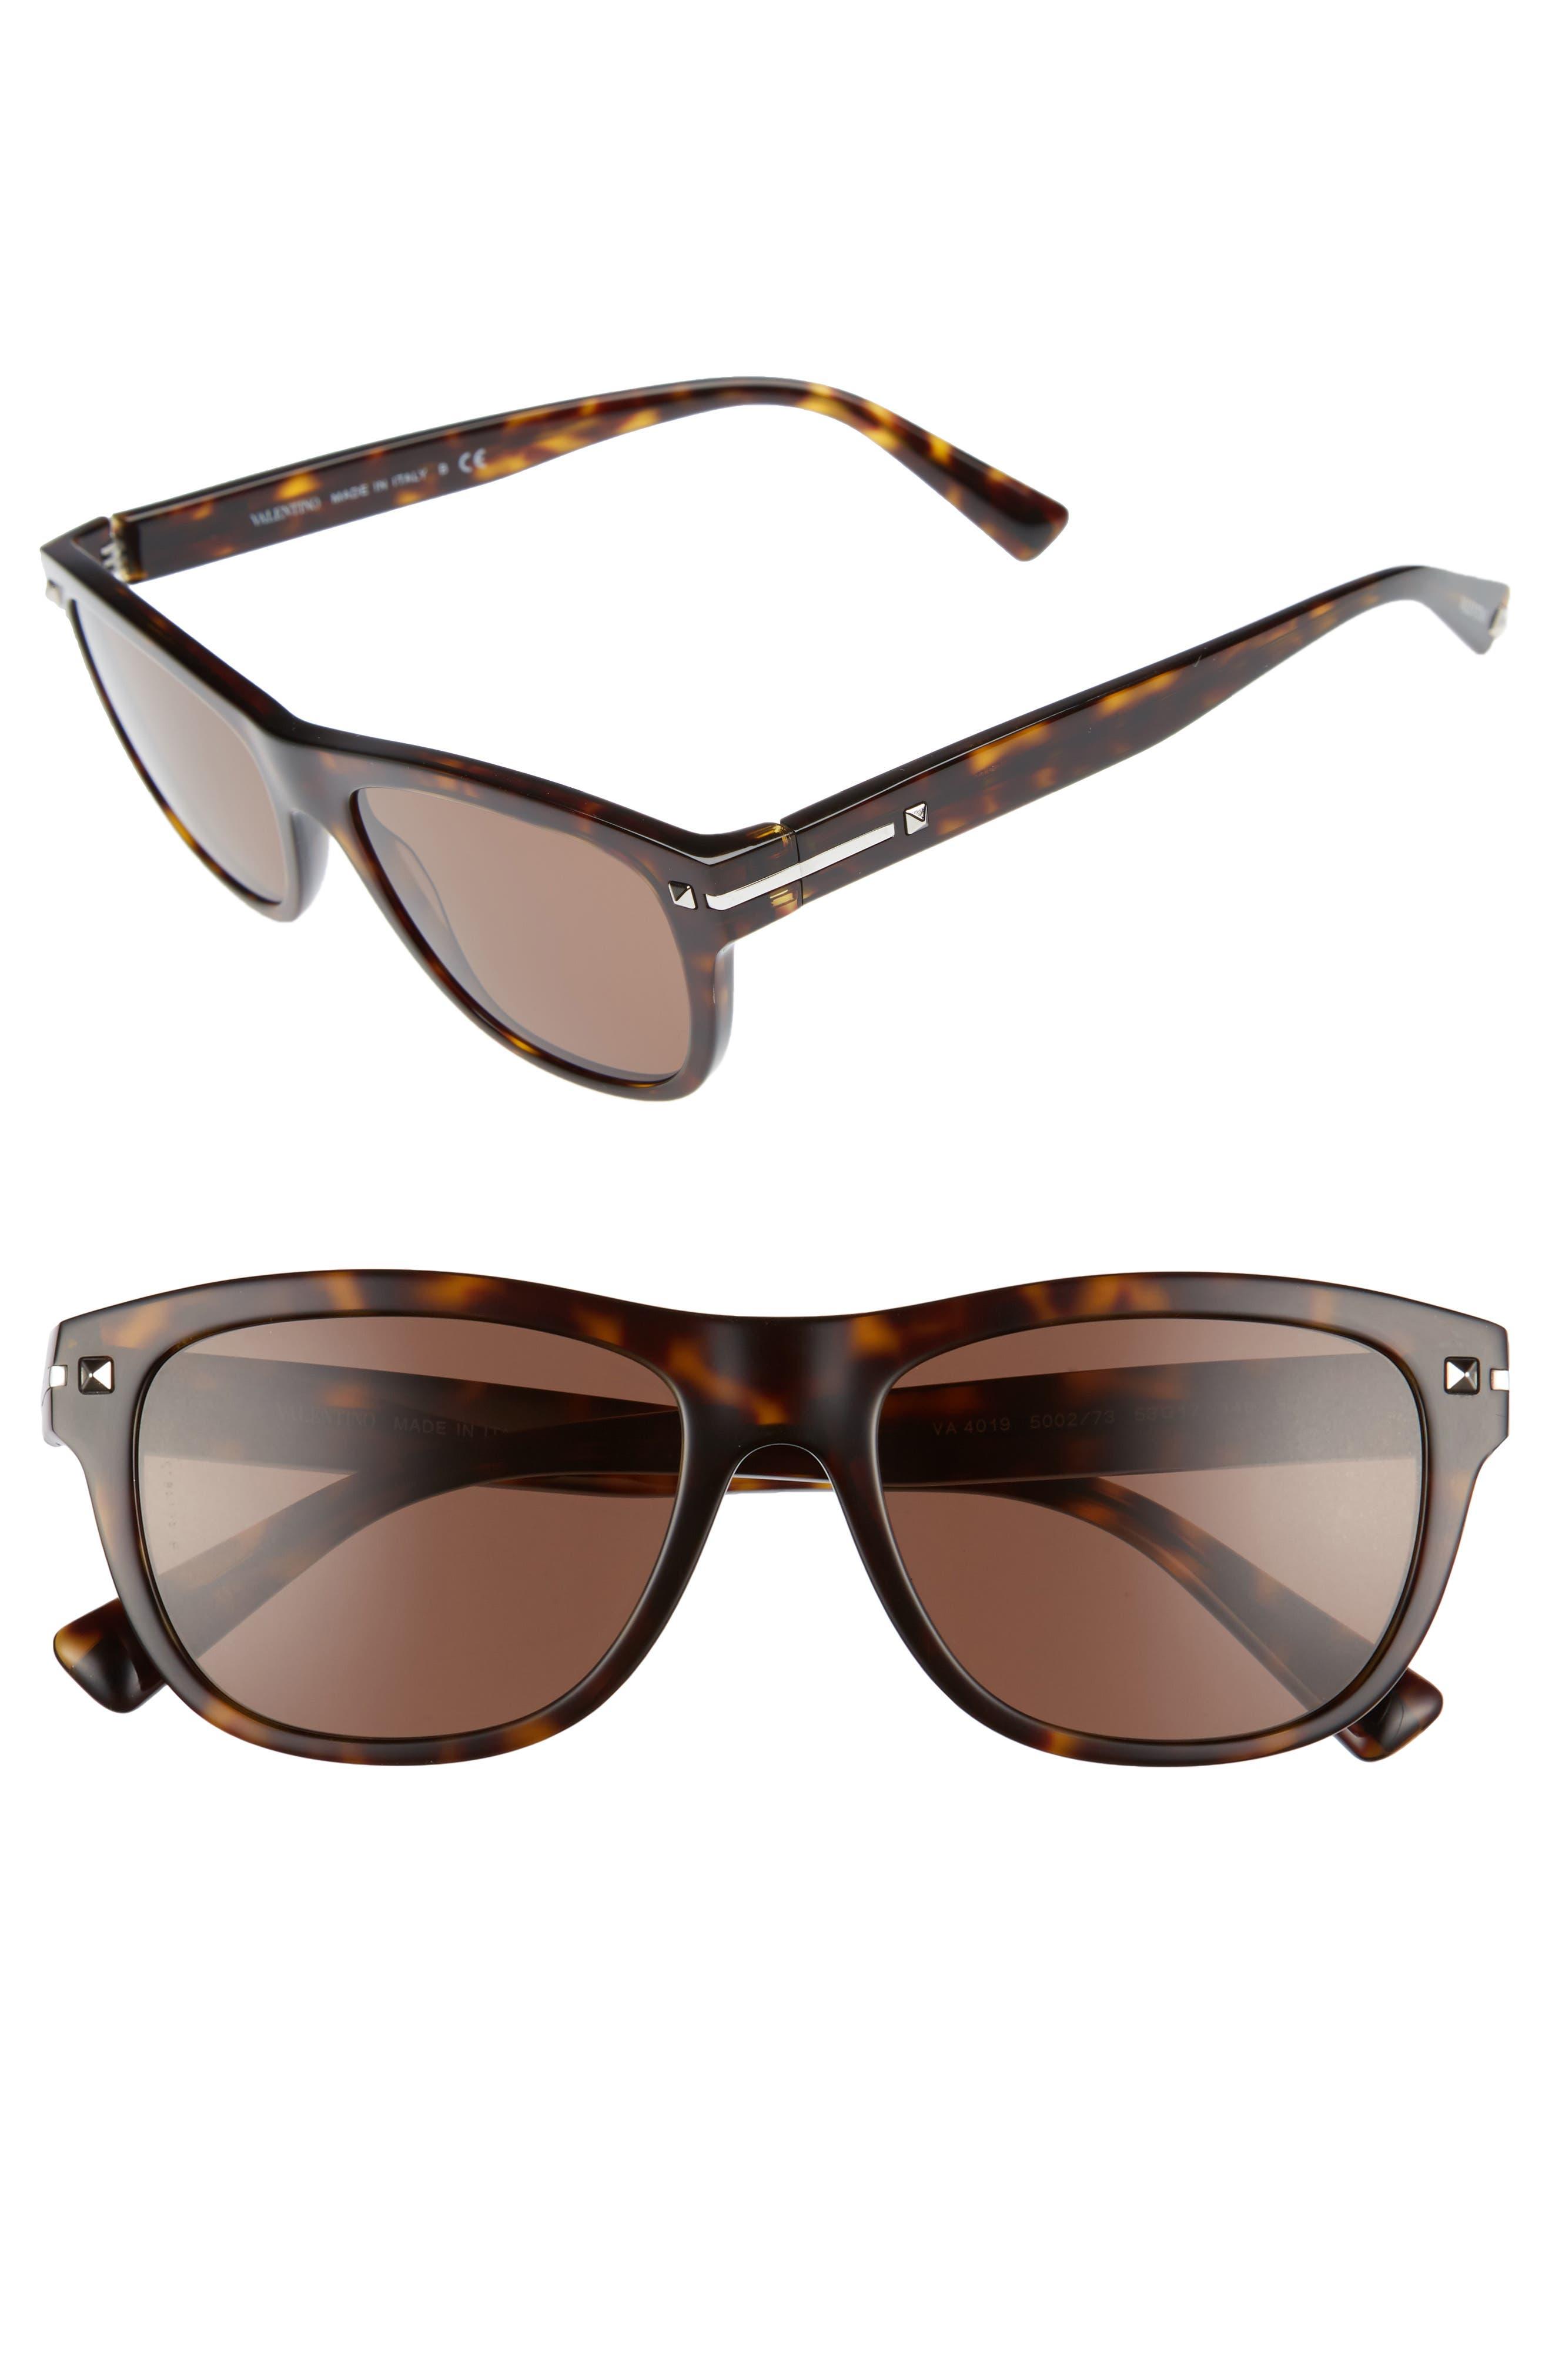 53mm Sunglasses,                             Main thumbnail 1, color,                             BROWN/ HAVANA